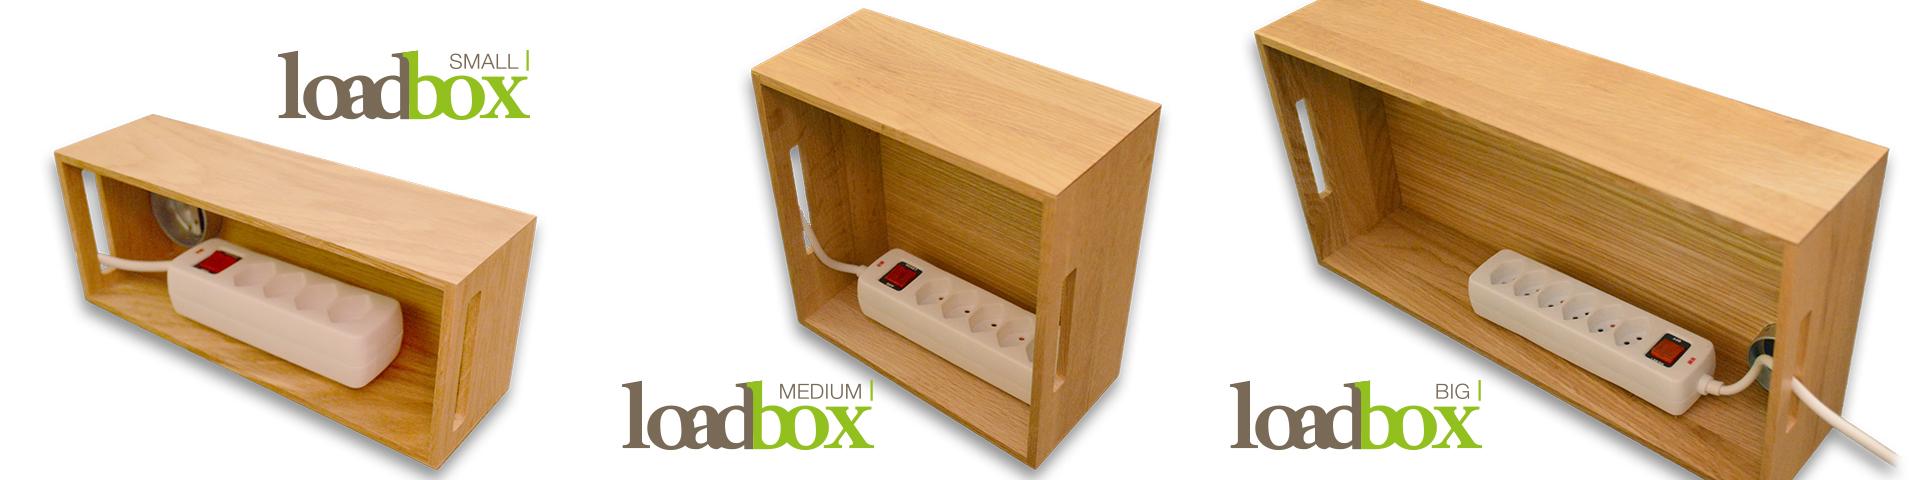 loadbox grössen